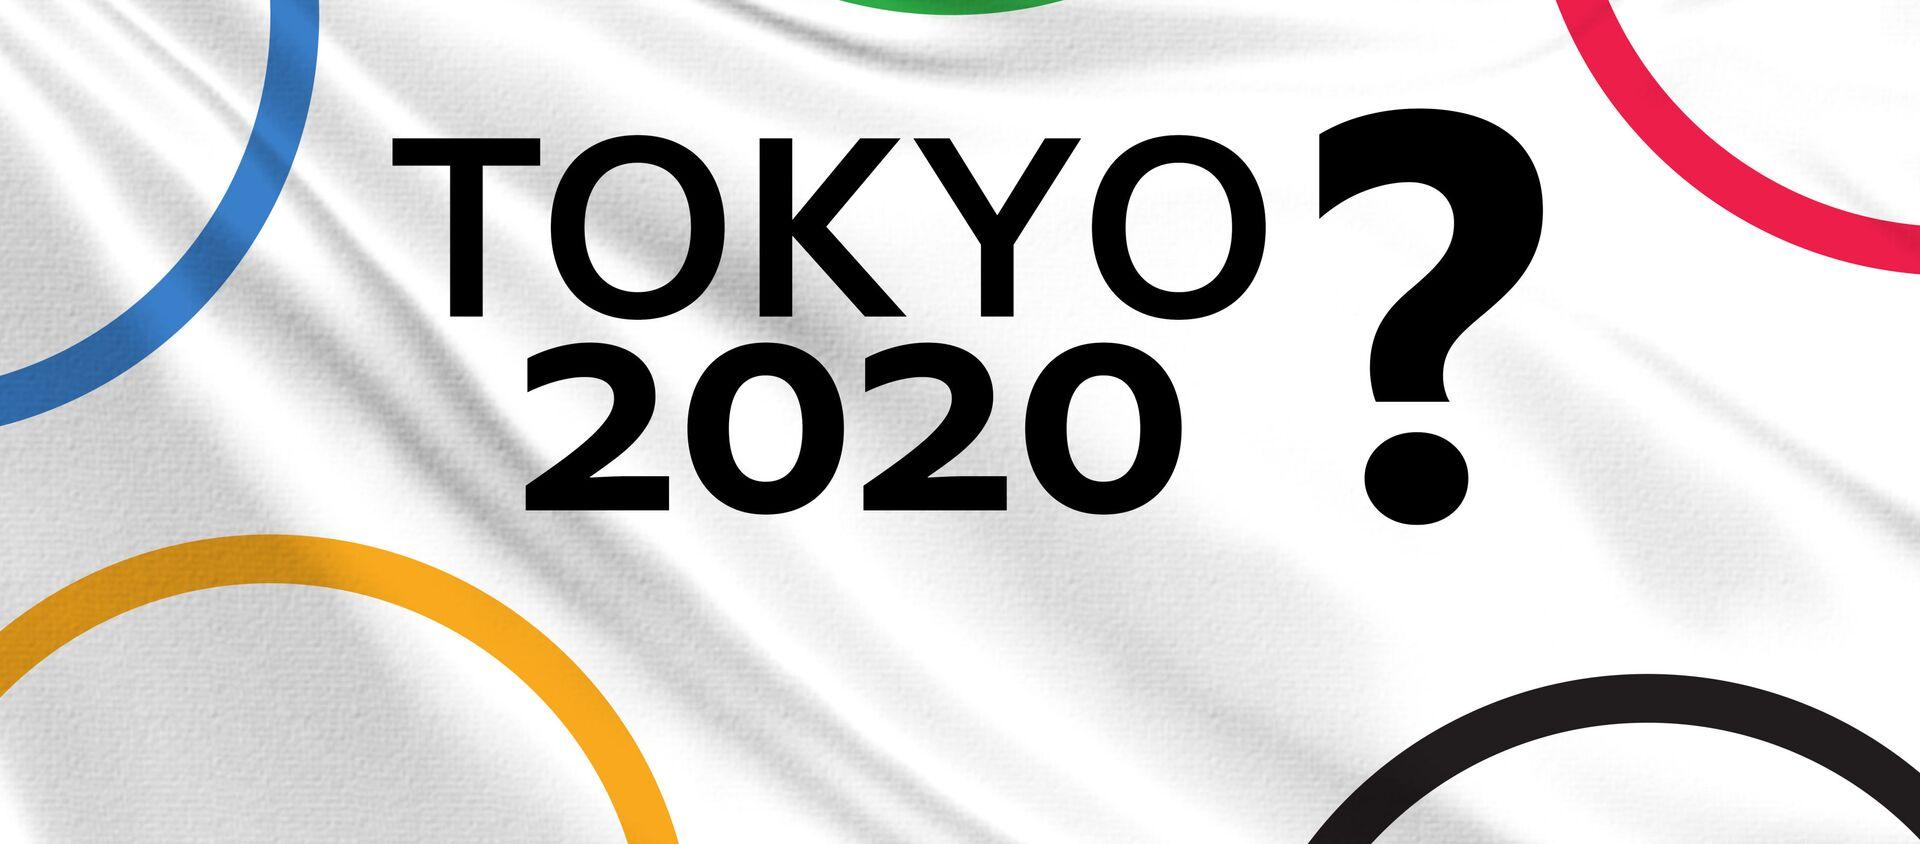 東京五輪ロゴ - Sputnik 日本, 1920, 19.07.2021